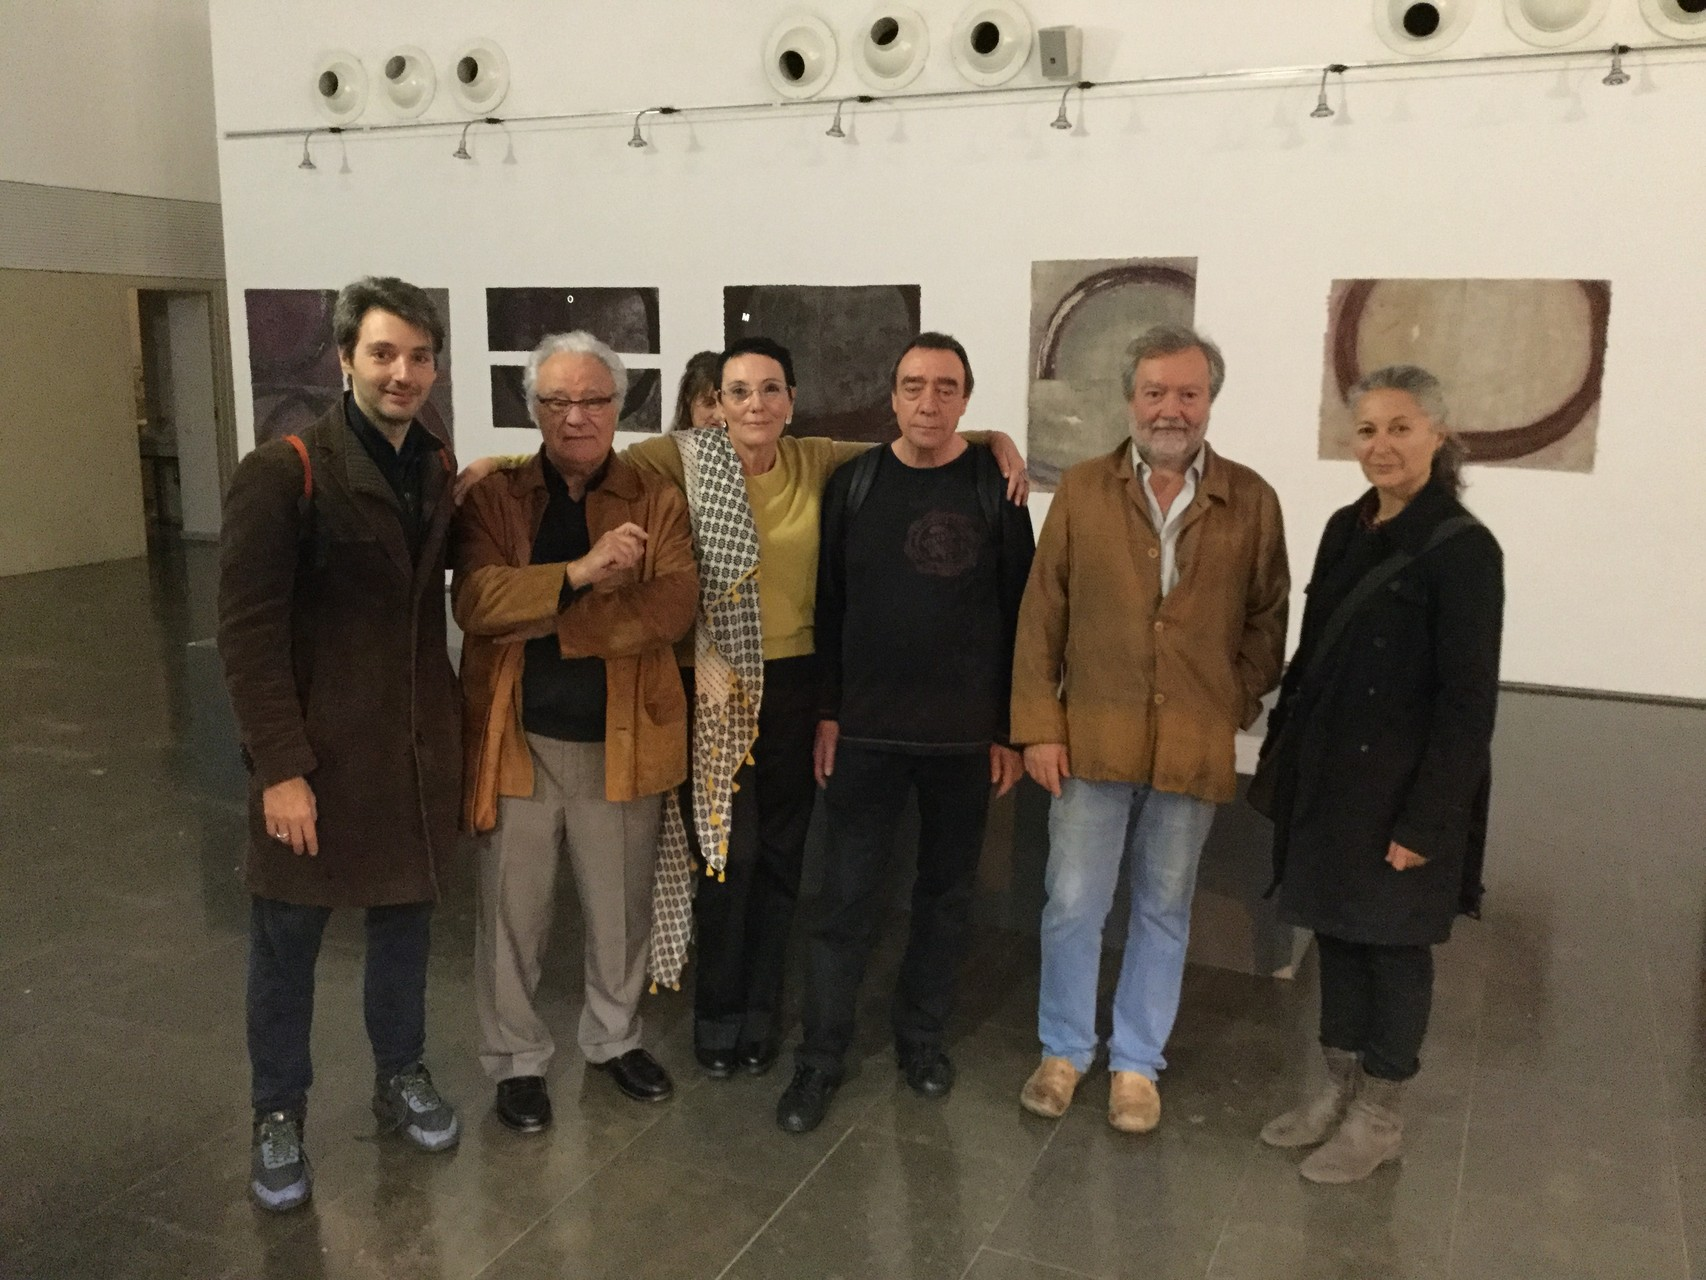 Om Barbarà, Josep Maria Aviles, jo, Manel Ruano, Virgili Barbarà y Pepa Busquè. Contenta de que asistieran